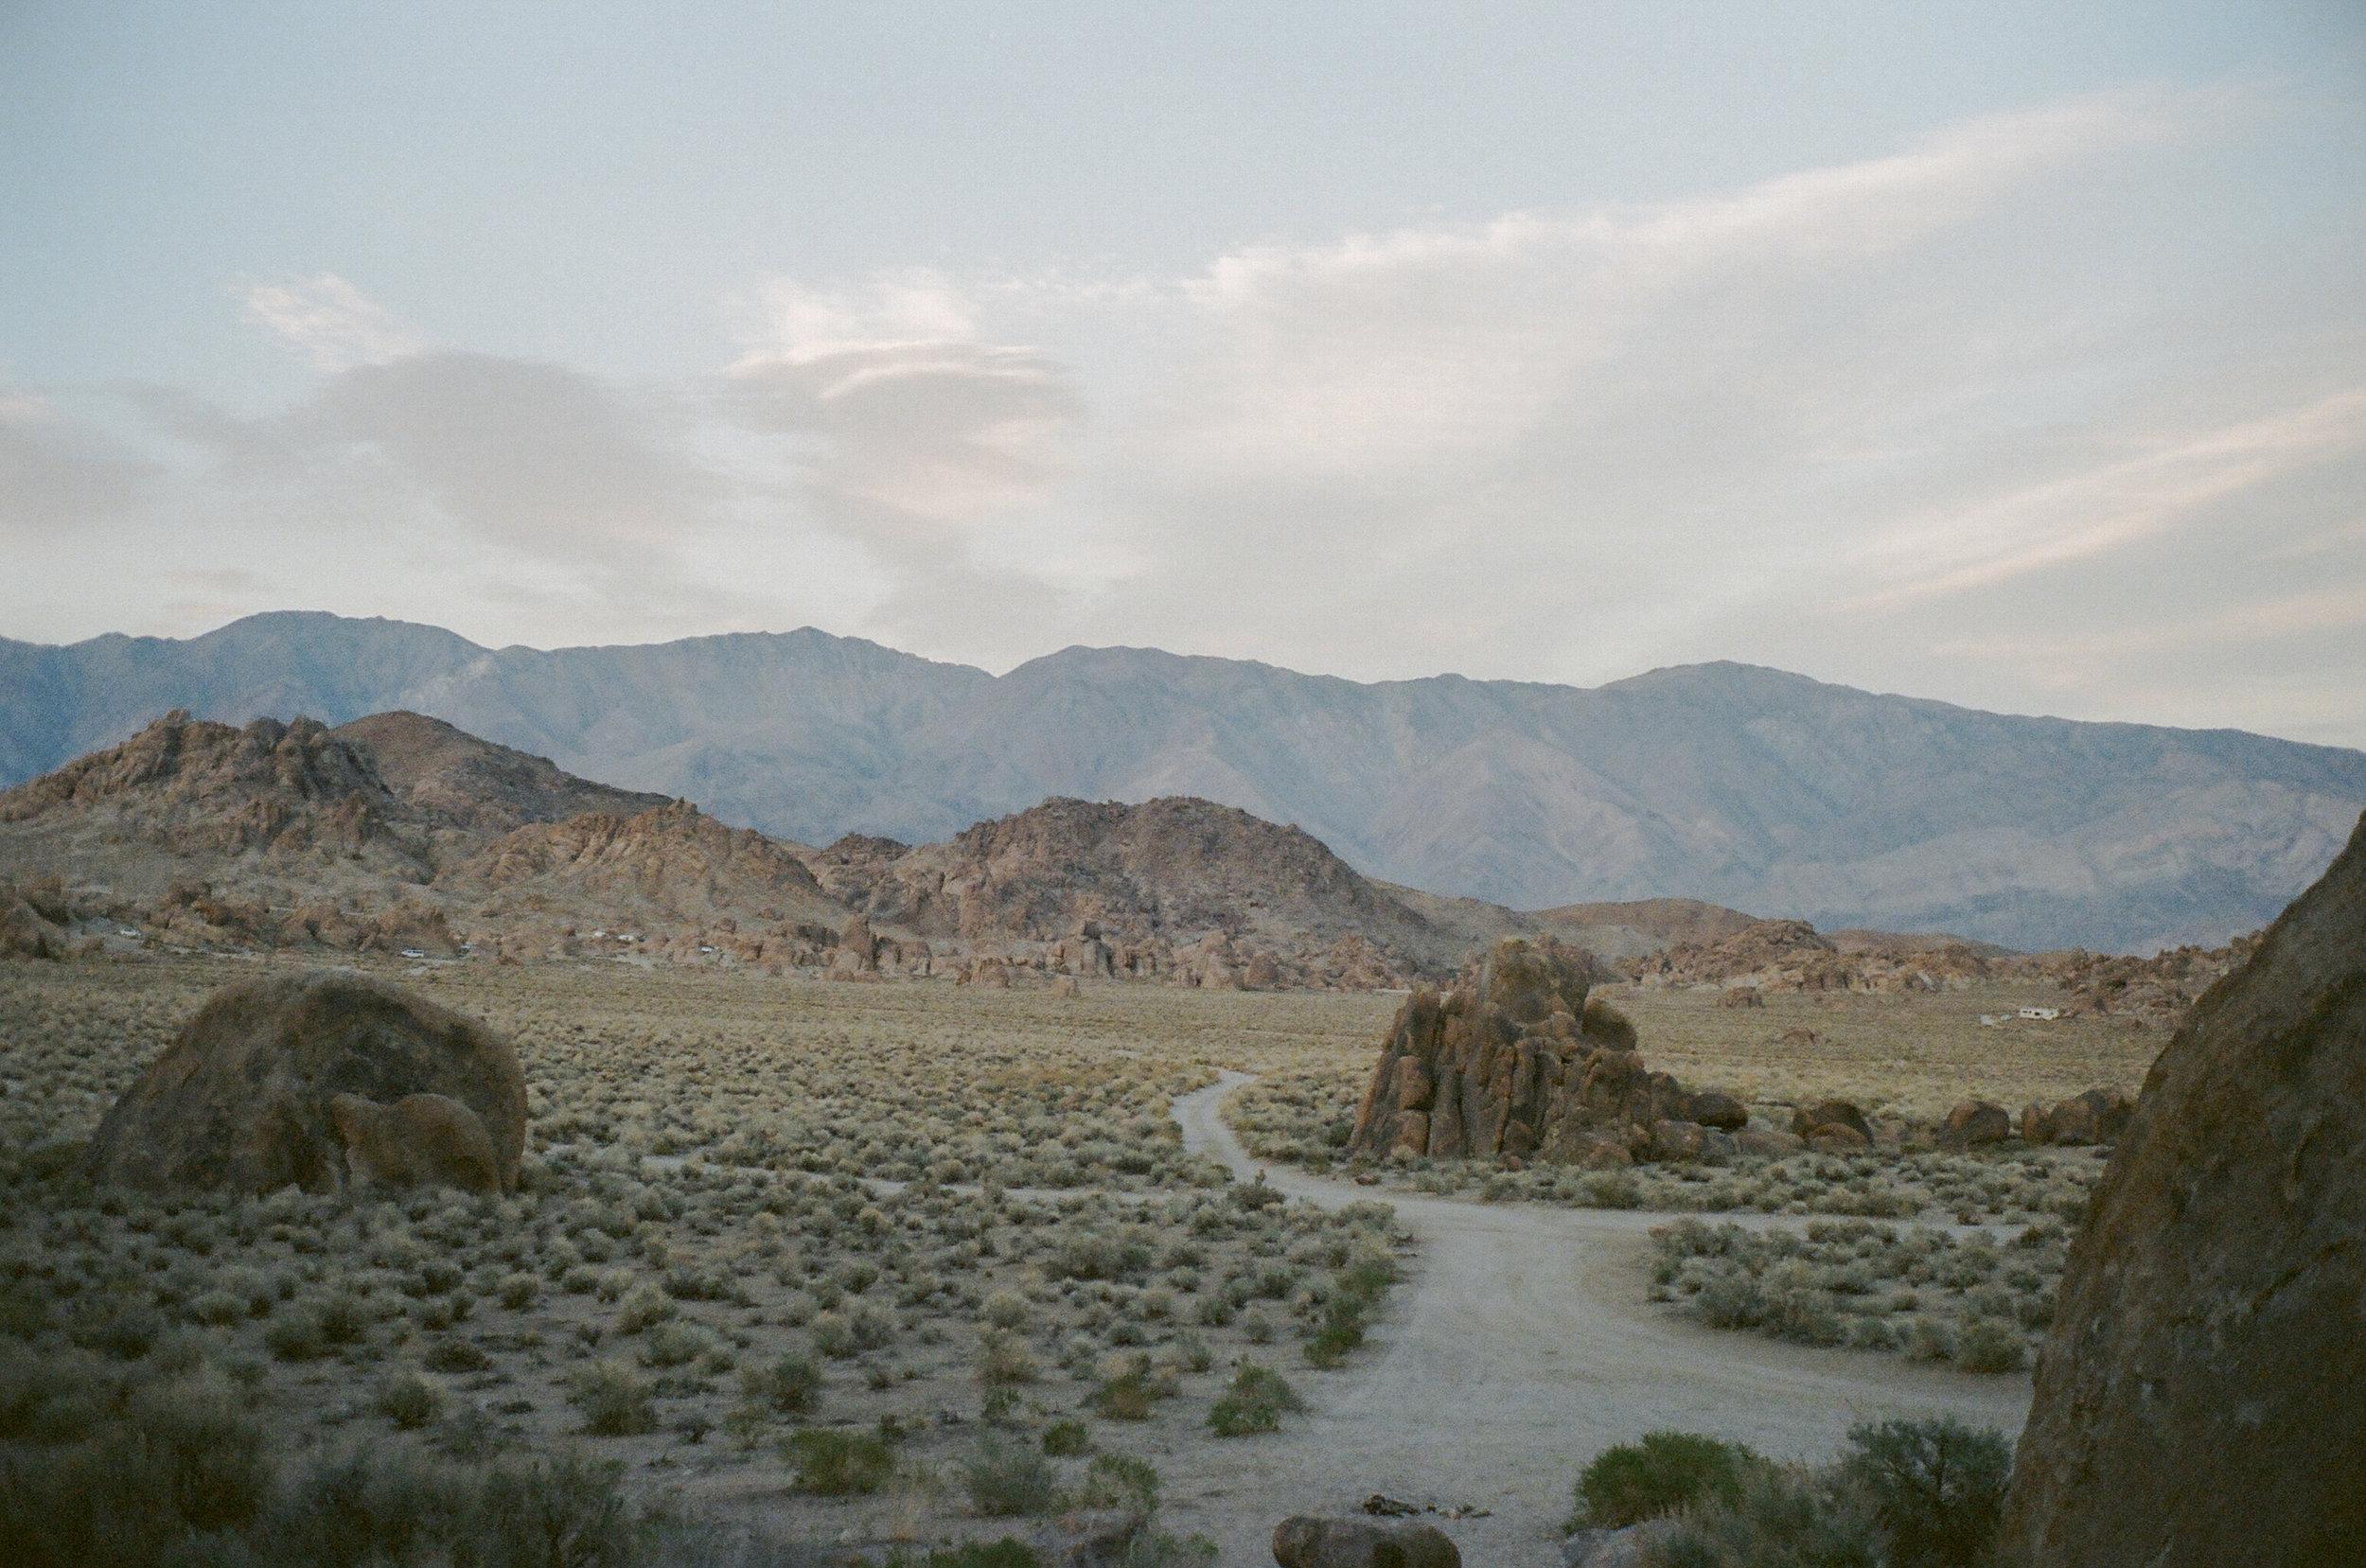 Eastern Sierras mountains